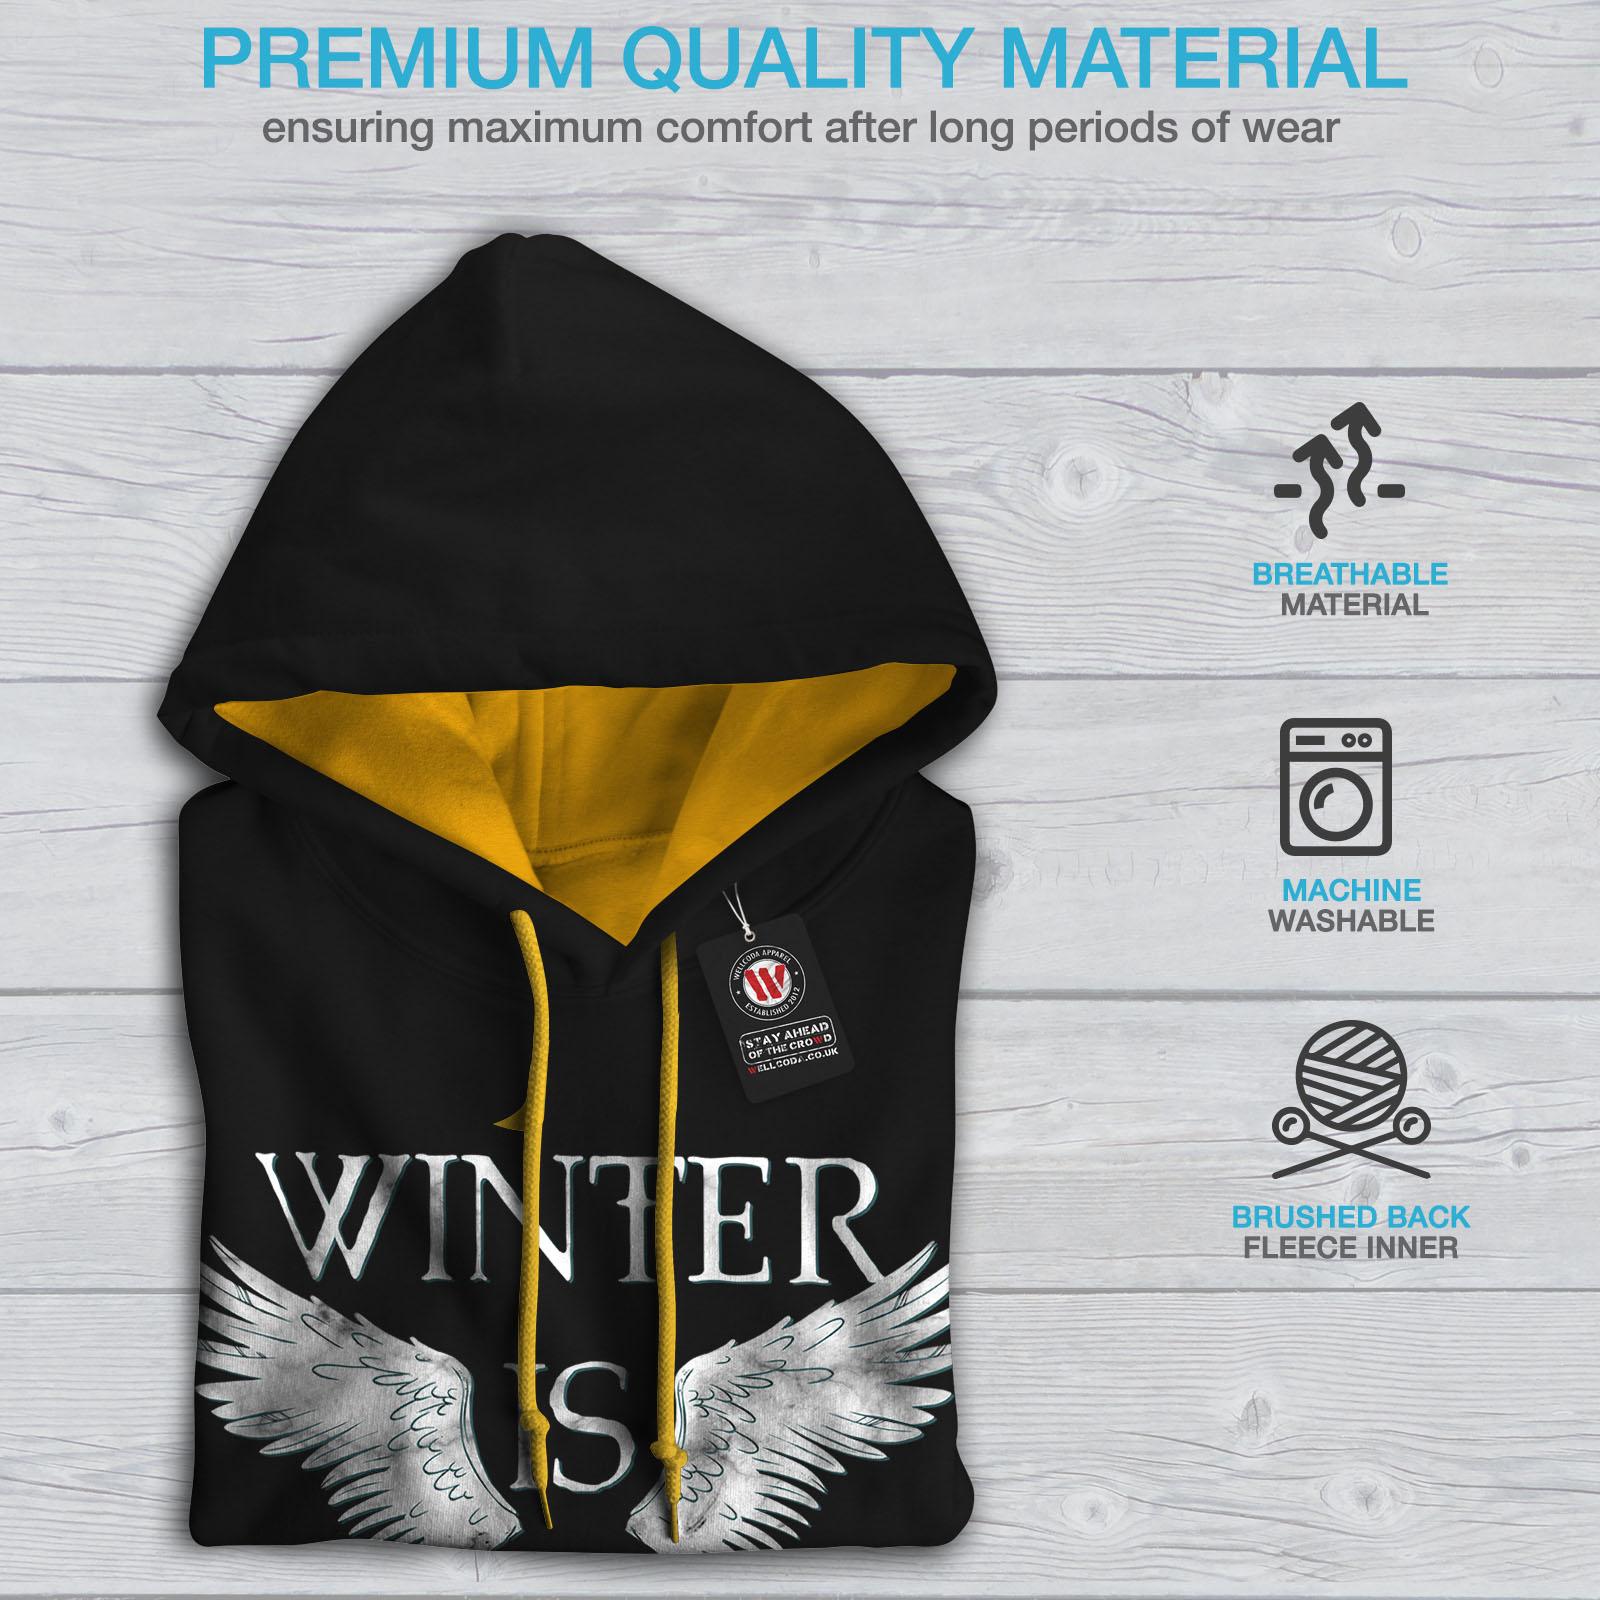 Hoodie Wellcoda Here Jumper Hood Winter Black Contrast gold Wings Mens Casual rII7BpWq6